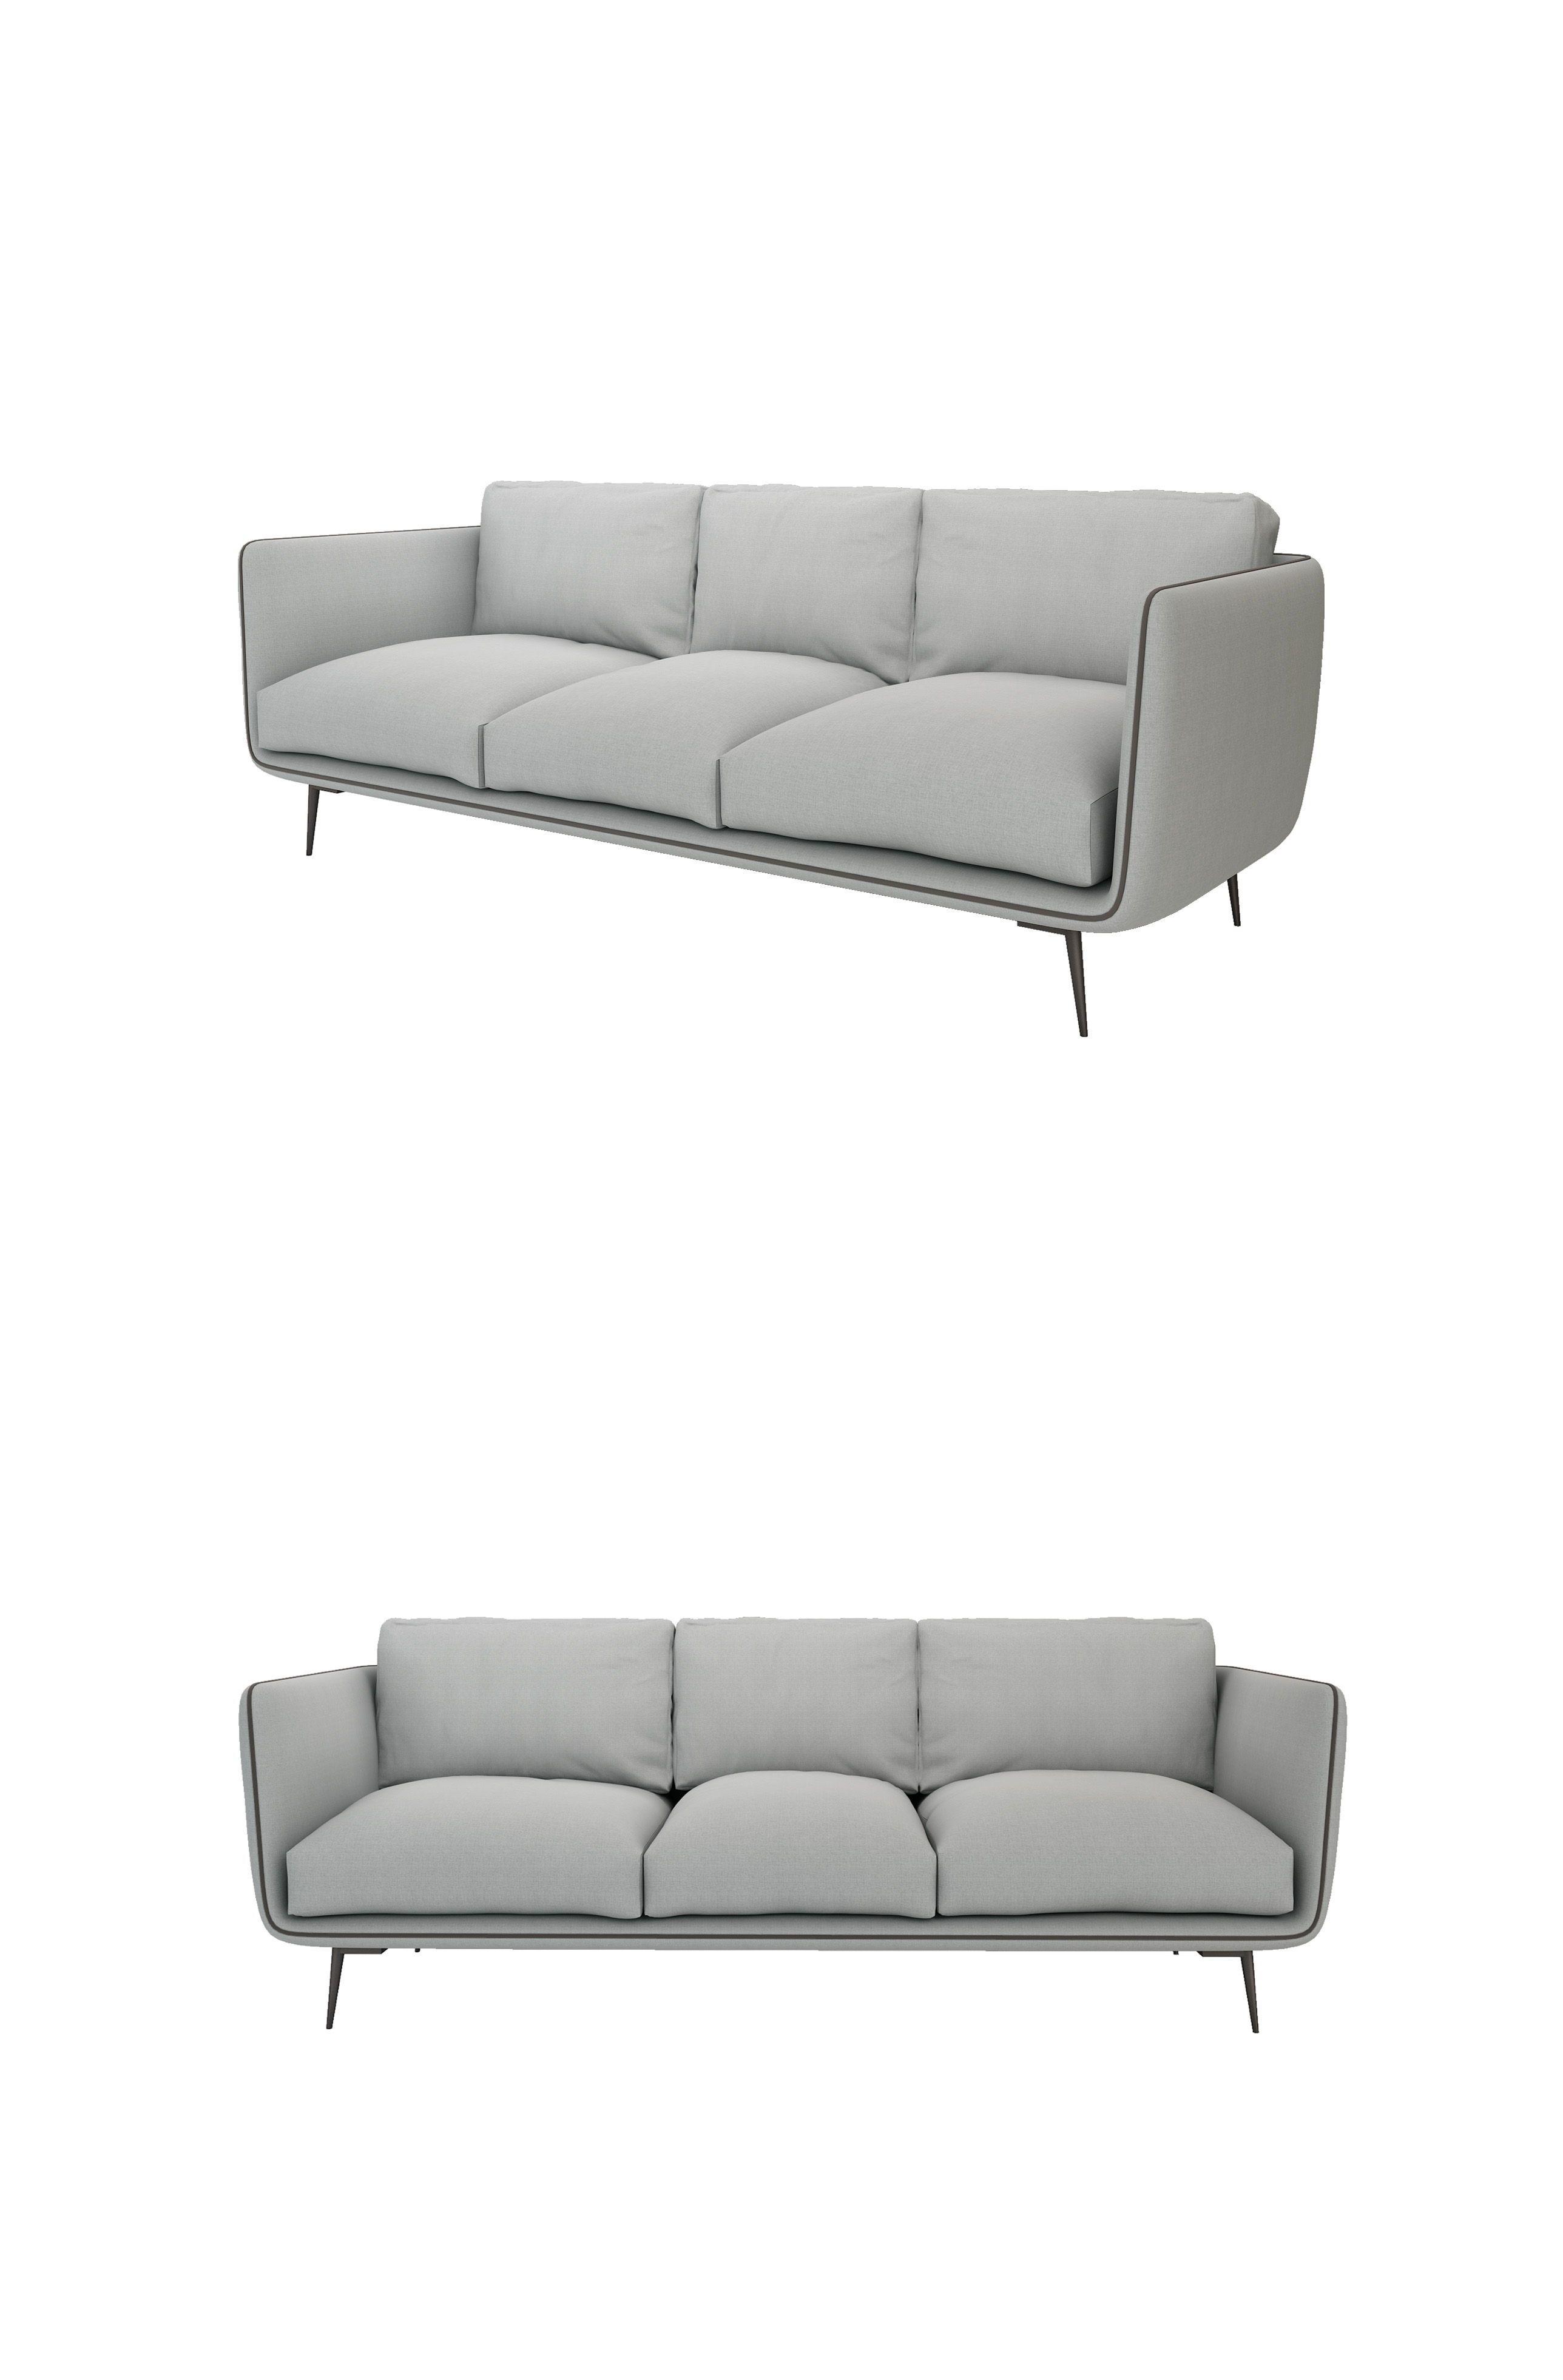 Modern Sofa Grey W2200 D850 H440 Height Birch Frame Fabric Metal Feet Comfy Sofa Mid Century Leather Sofa Outdoor Sofa Comfy Sofa